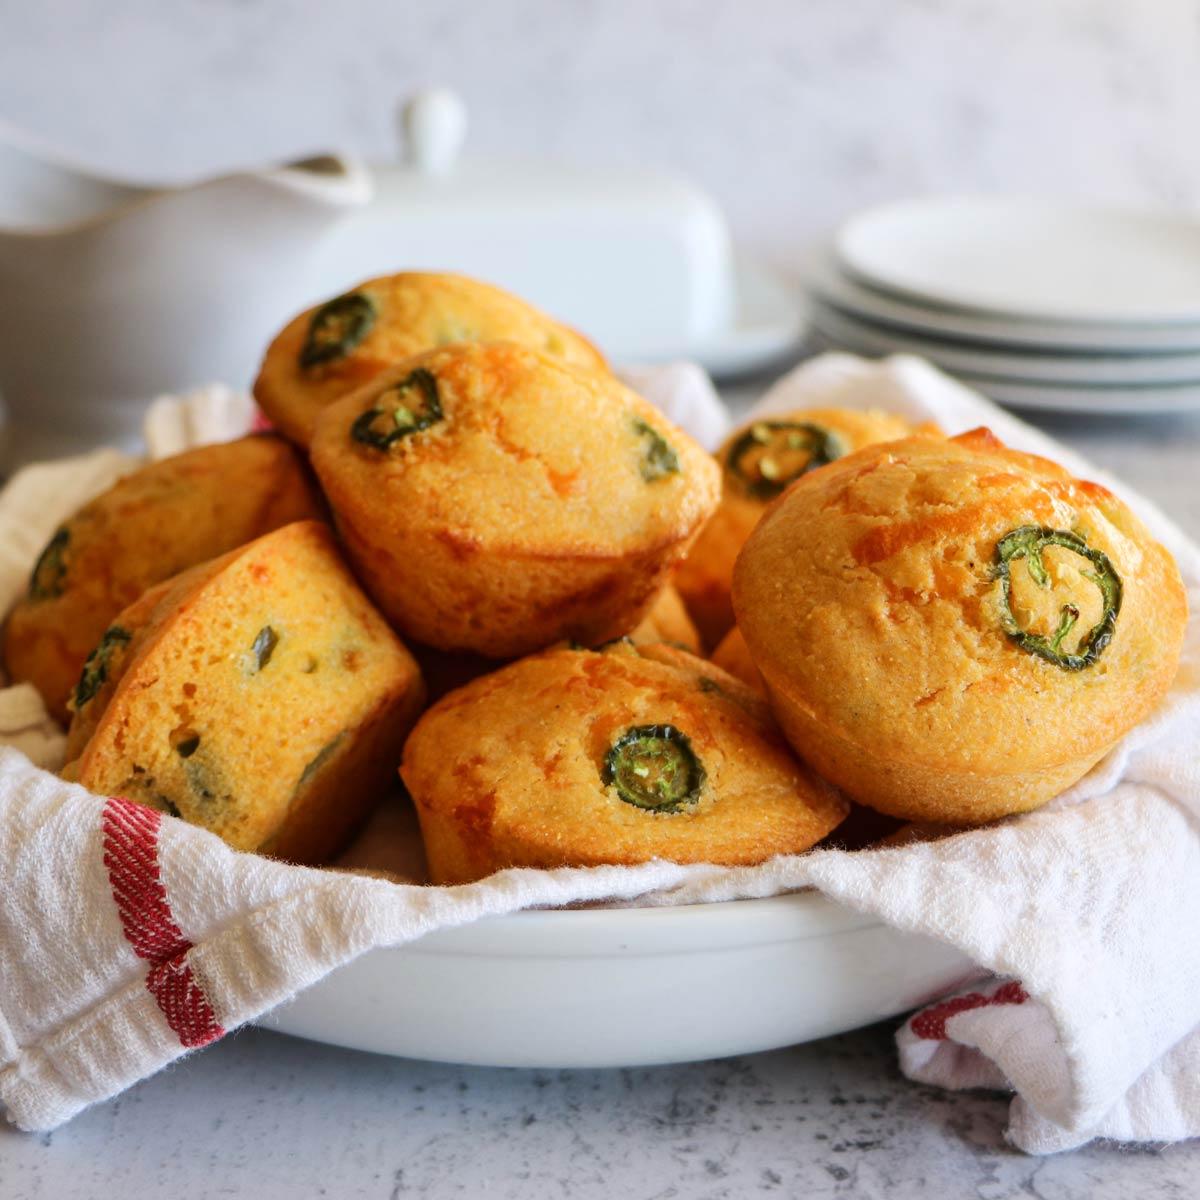 Cheddar-Jalapeno-Muffin-Landscape